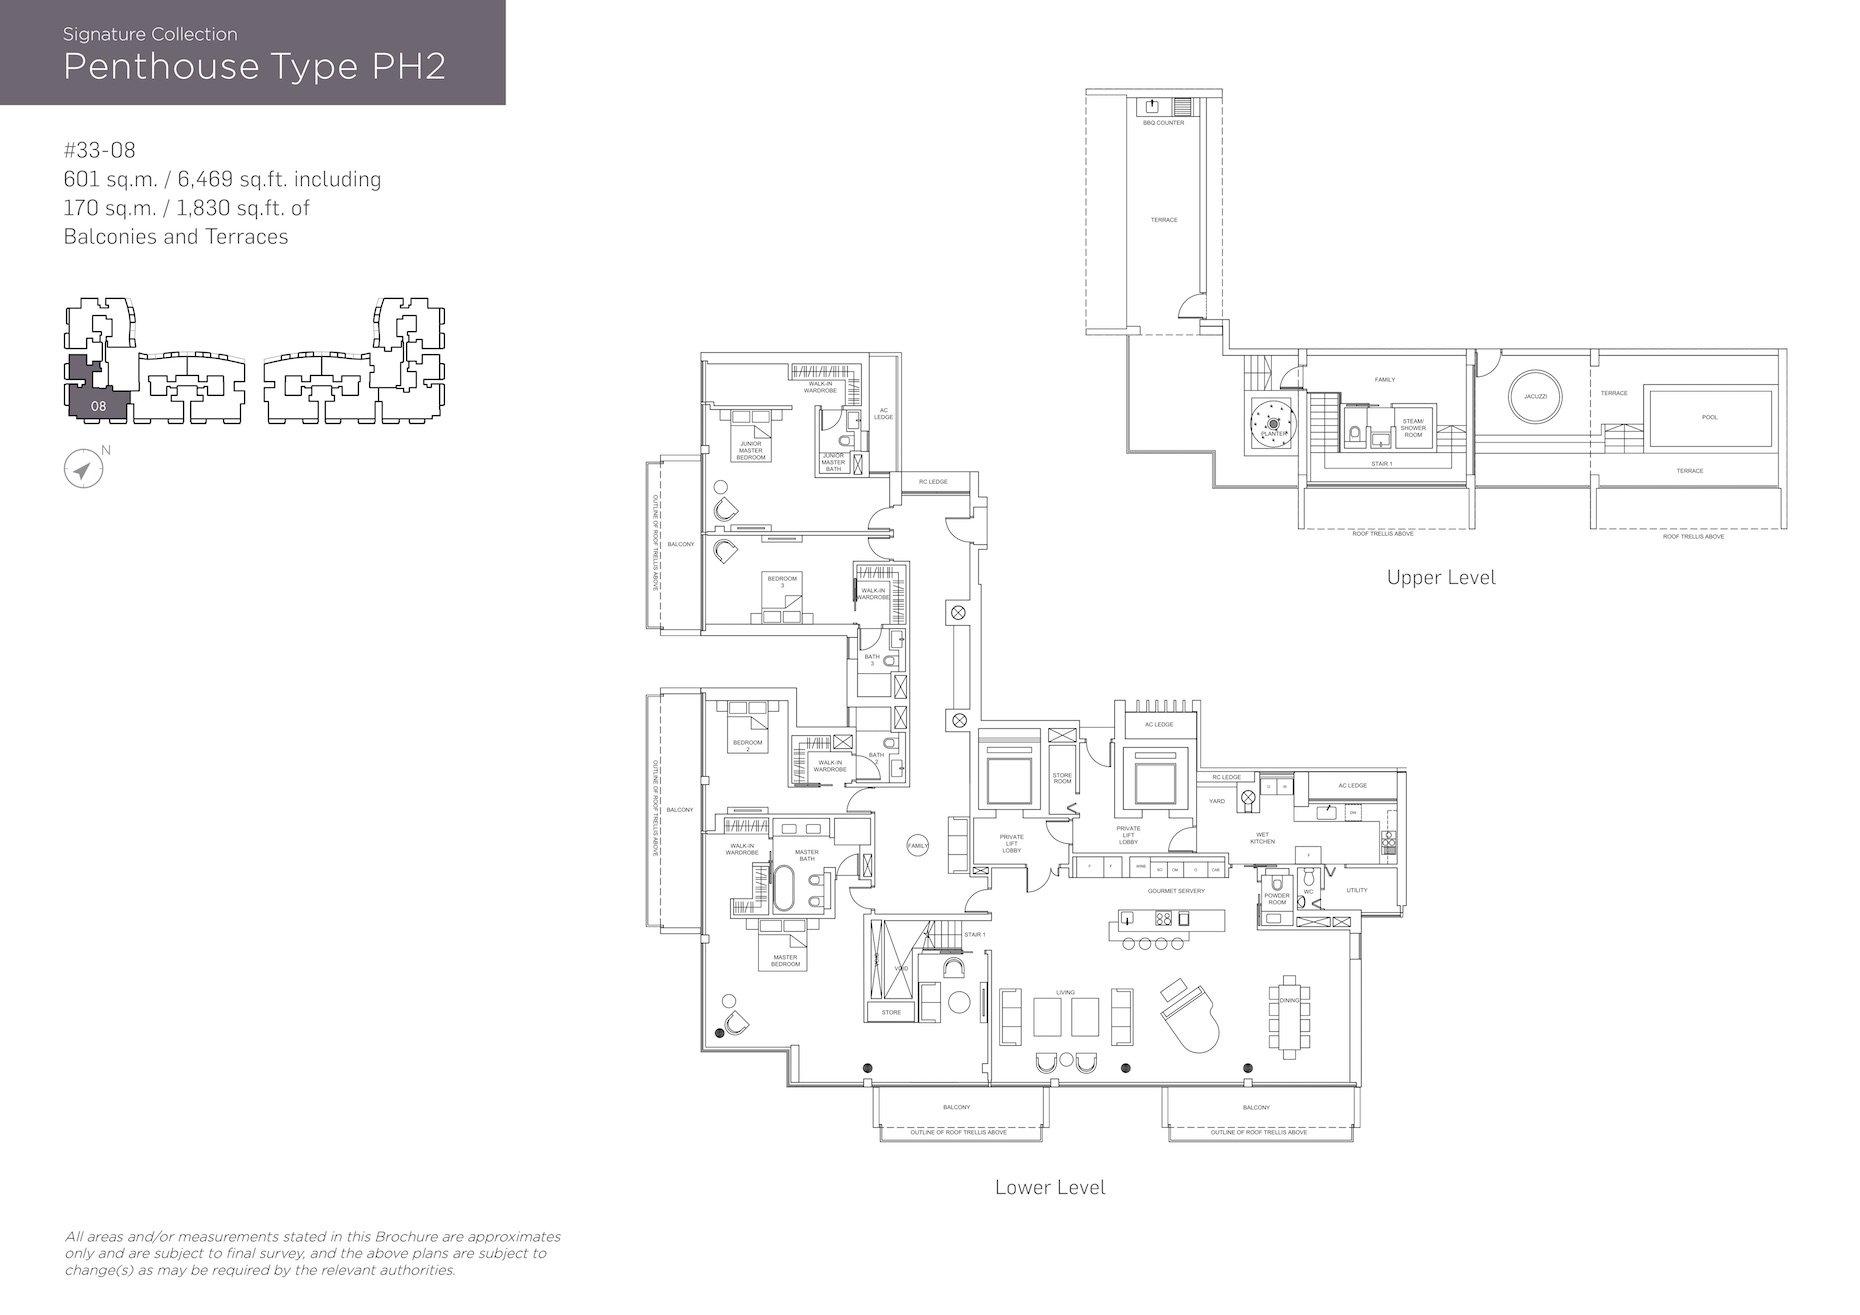 Marina One Residences 滨海盛景豪苑 floor plans PH2